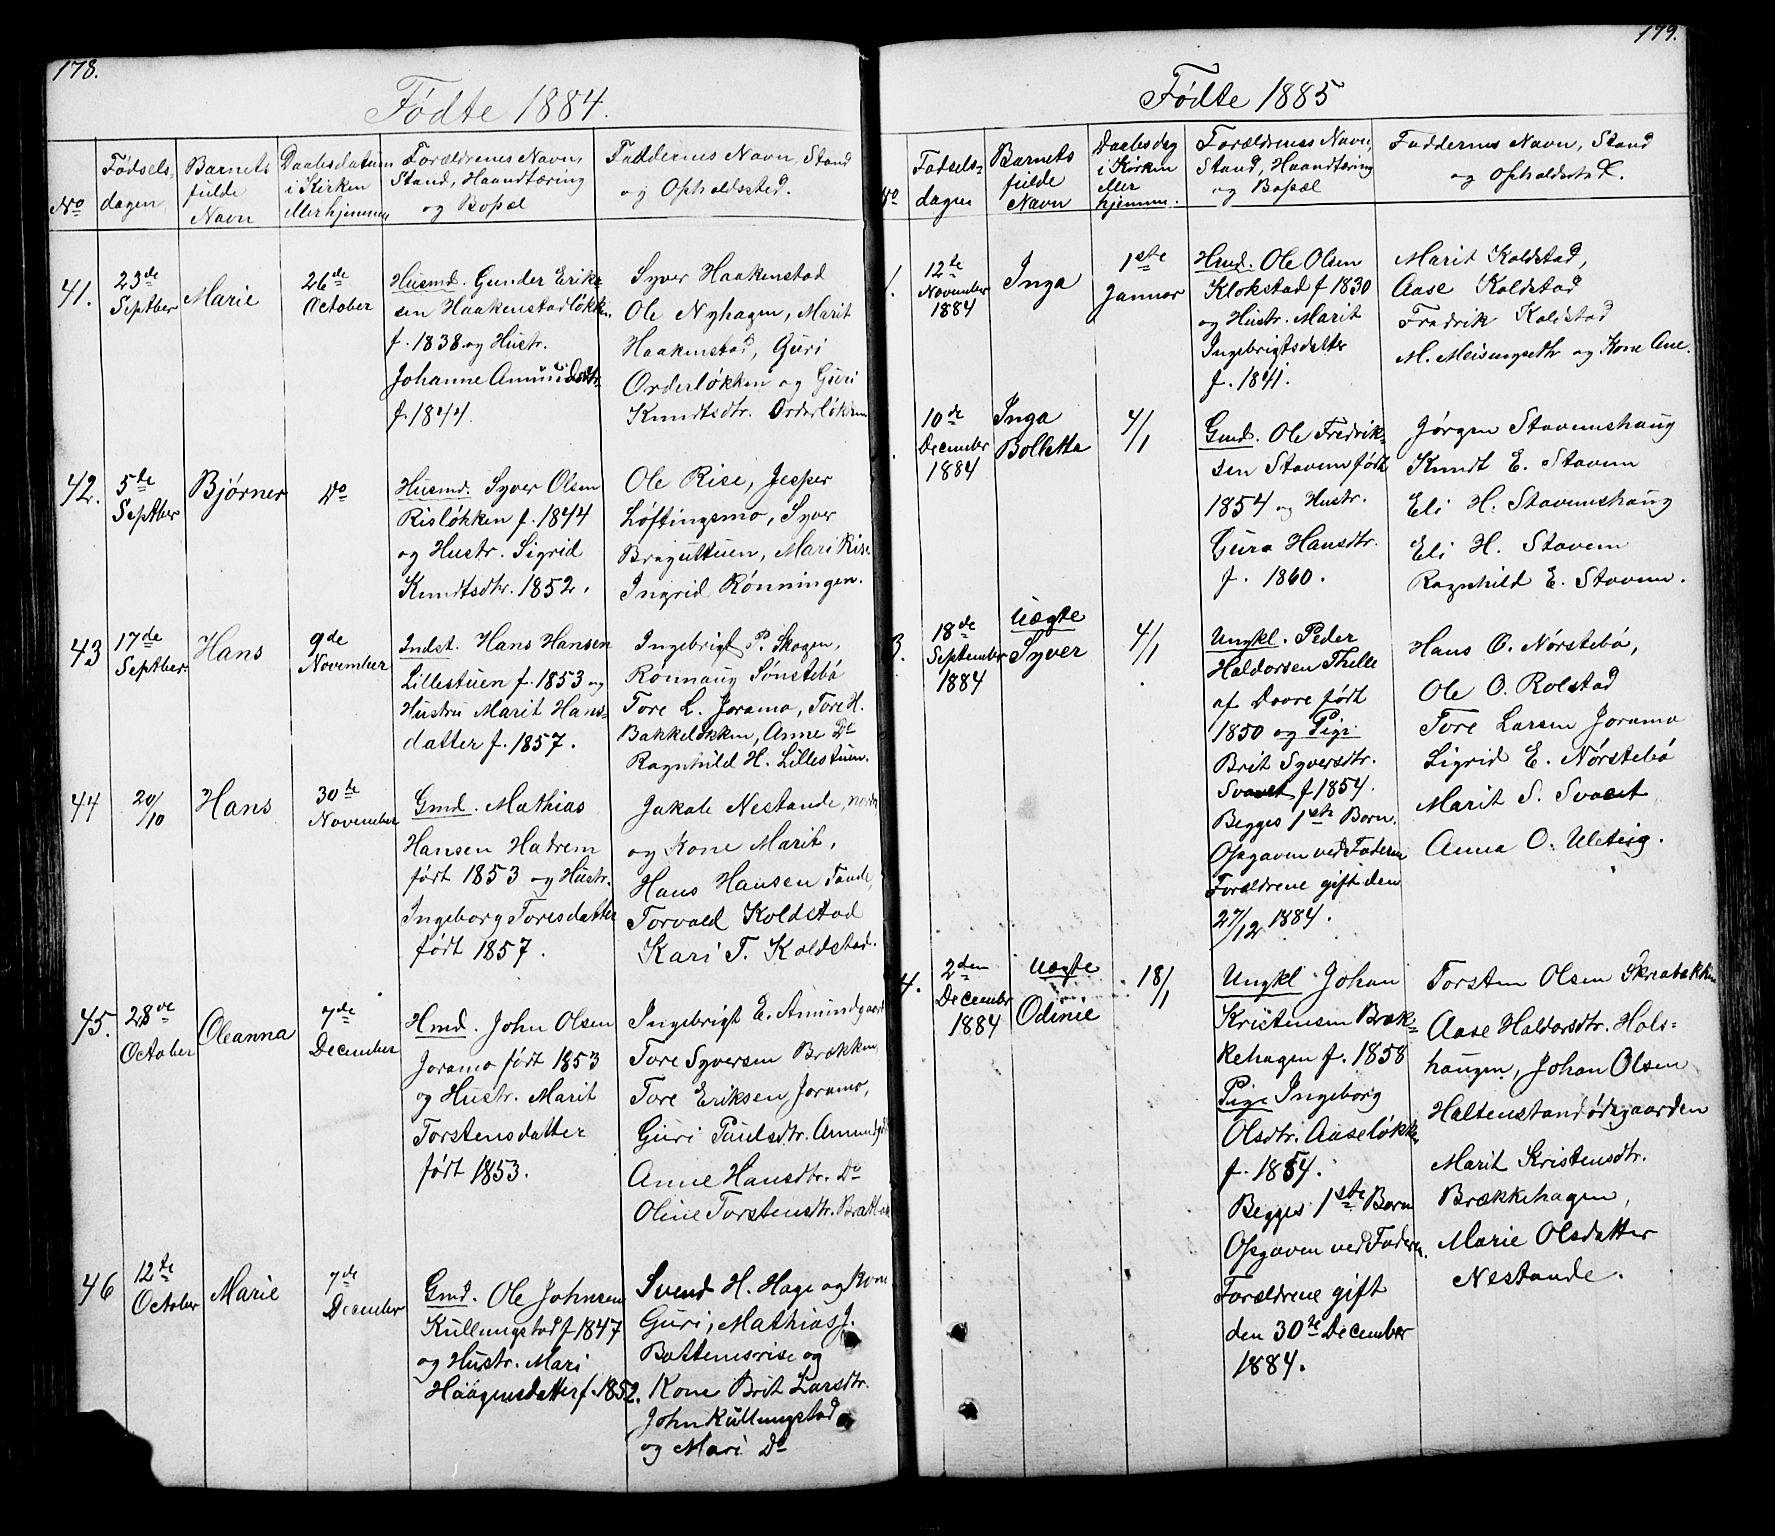 SAH, Lesja prestekontor, Klokkerbok nr. 5, 1850-1894, s. 178-179